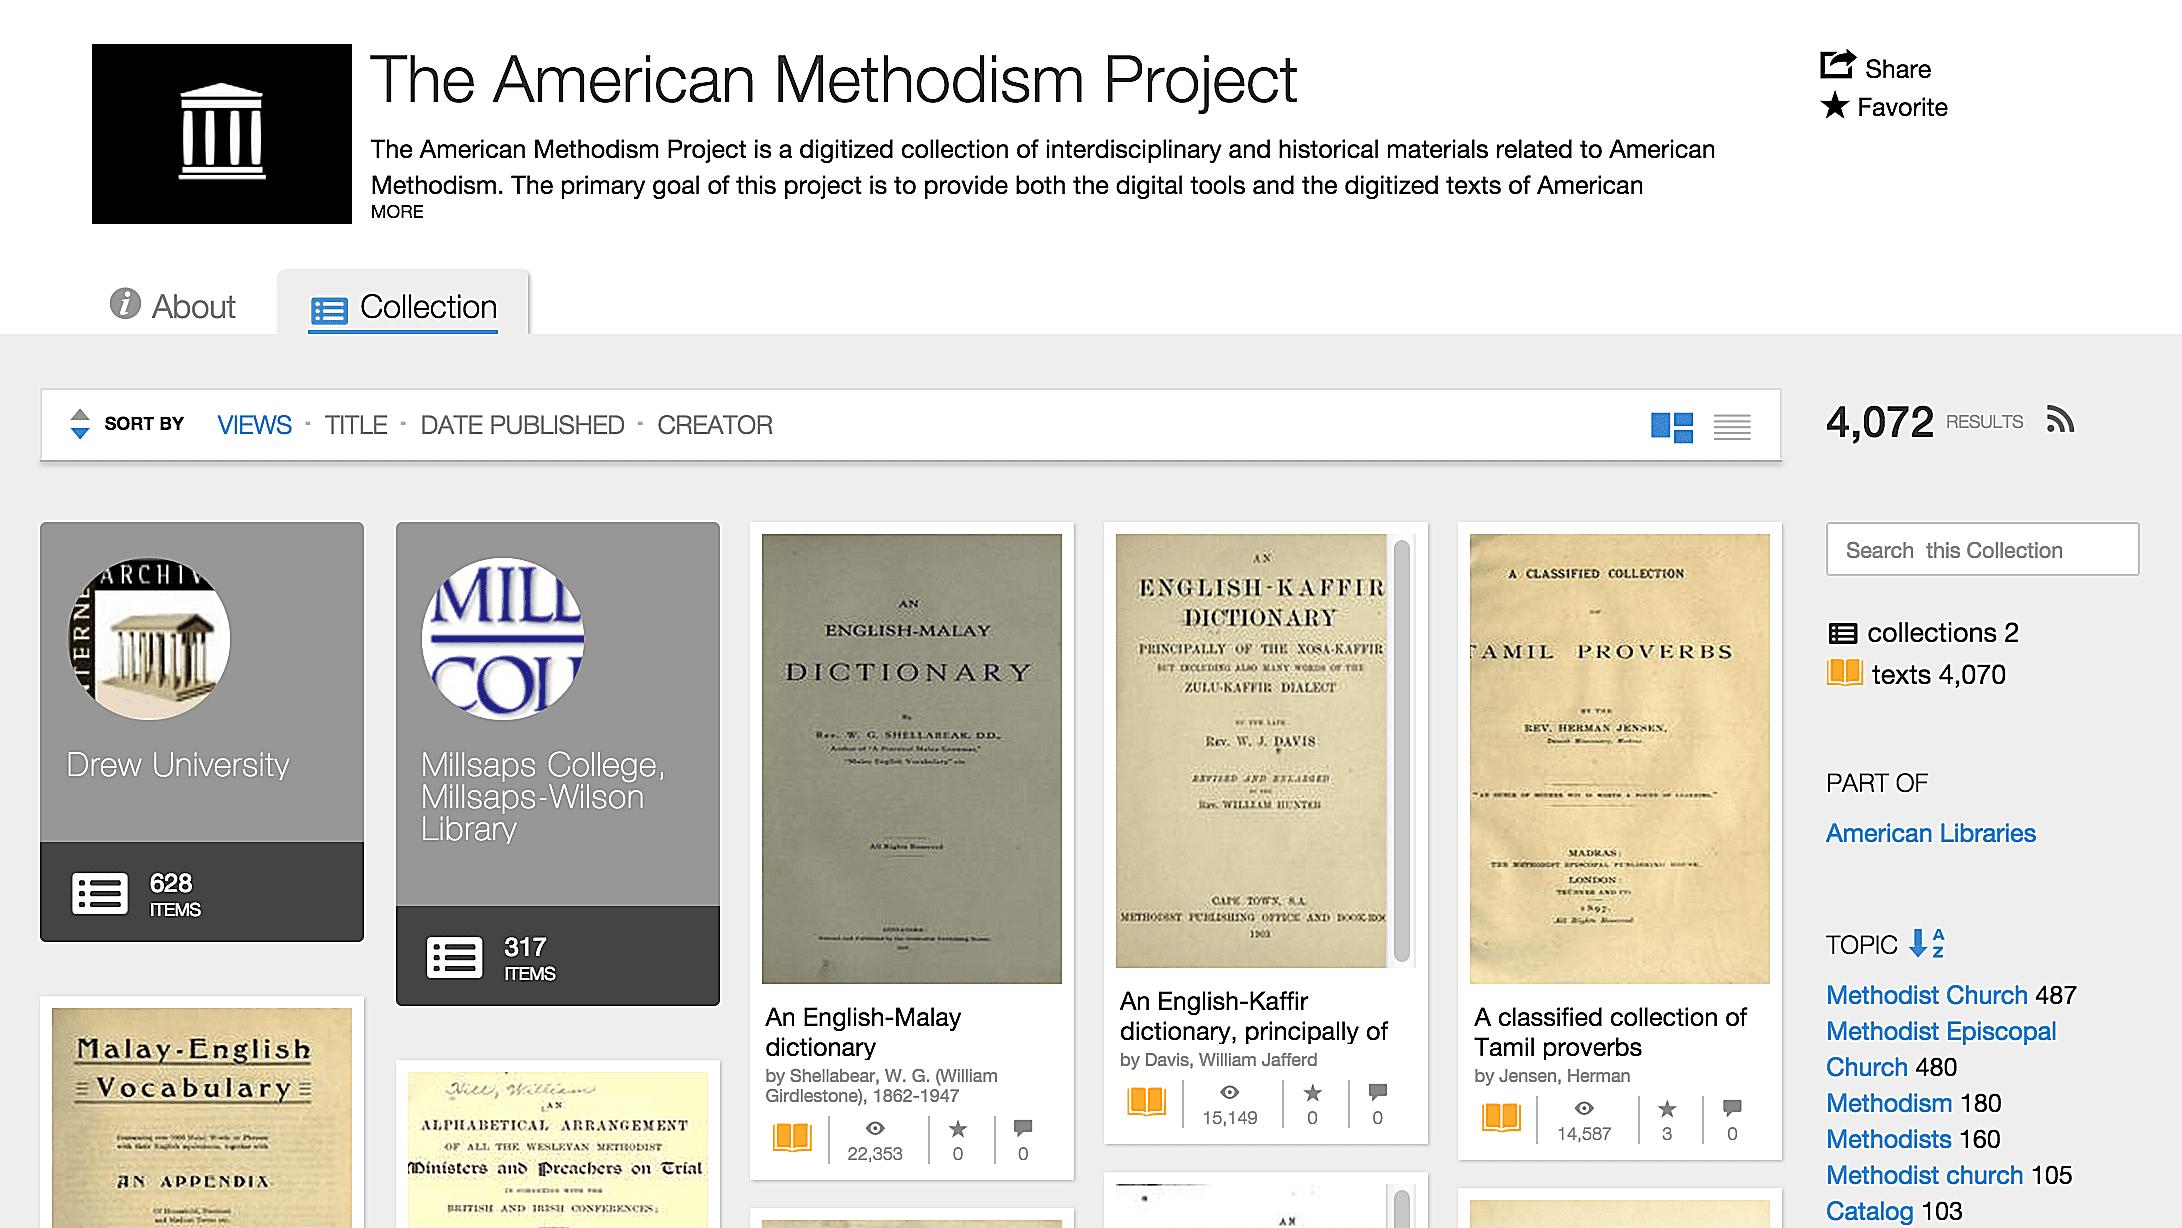 american methodist project